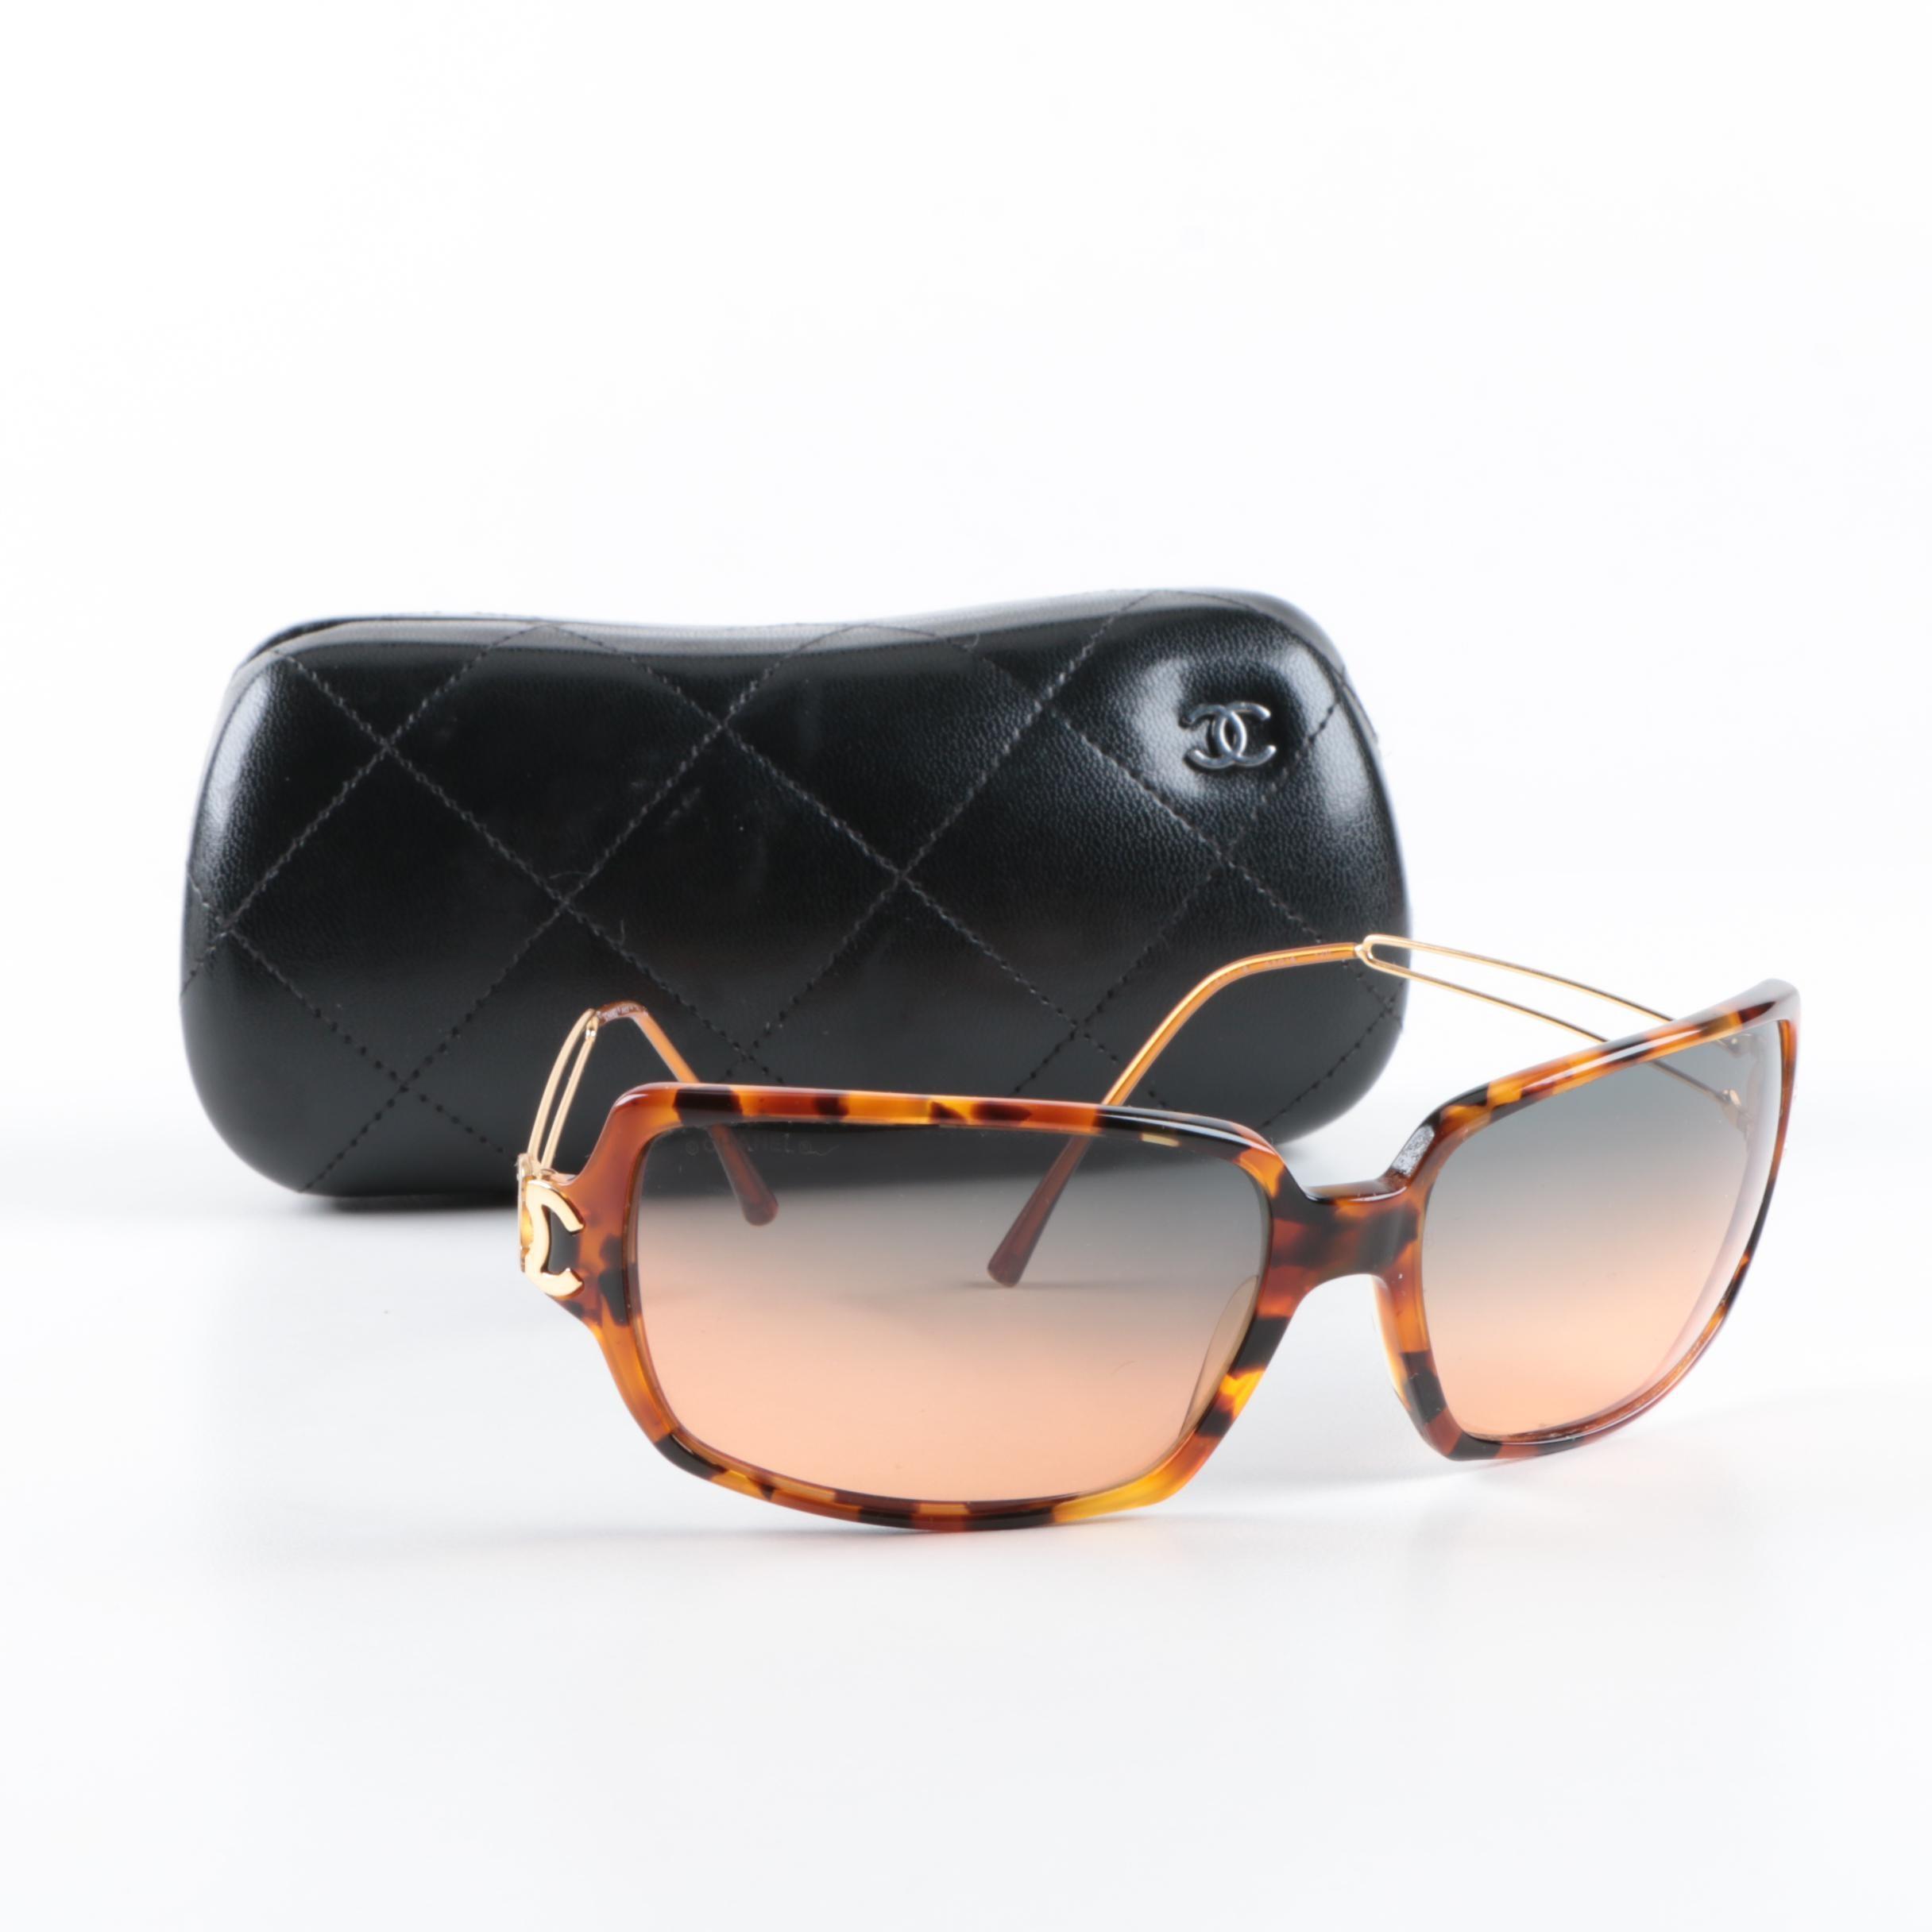 Chanel Tortoiseshell Style Sunglasses